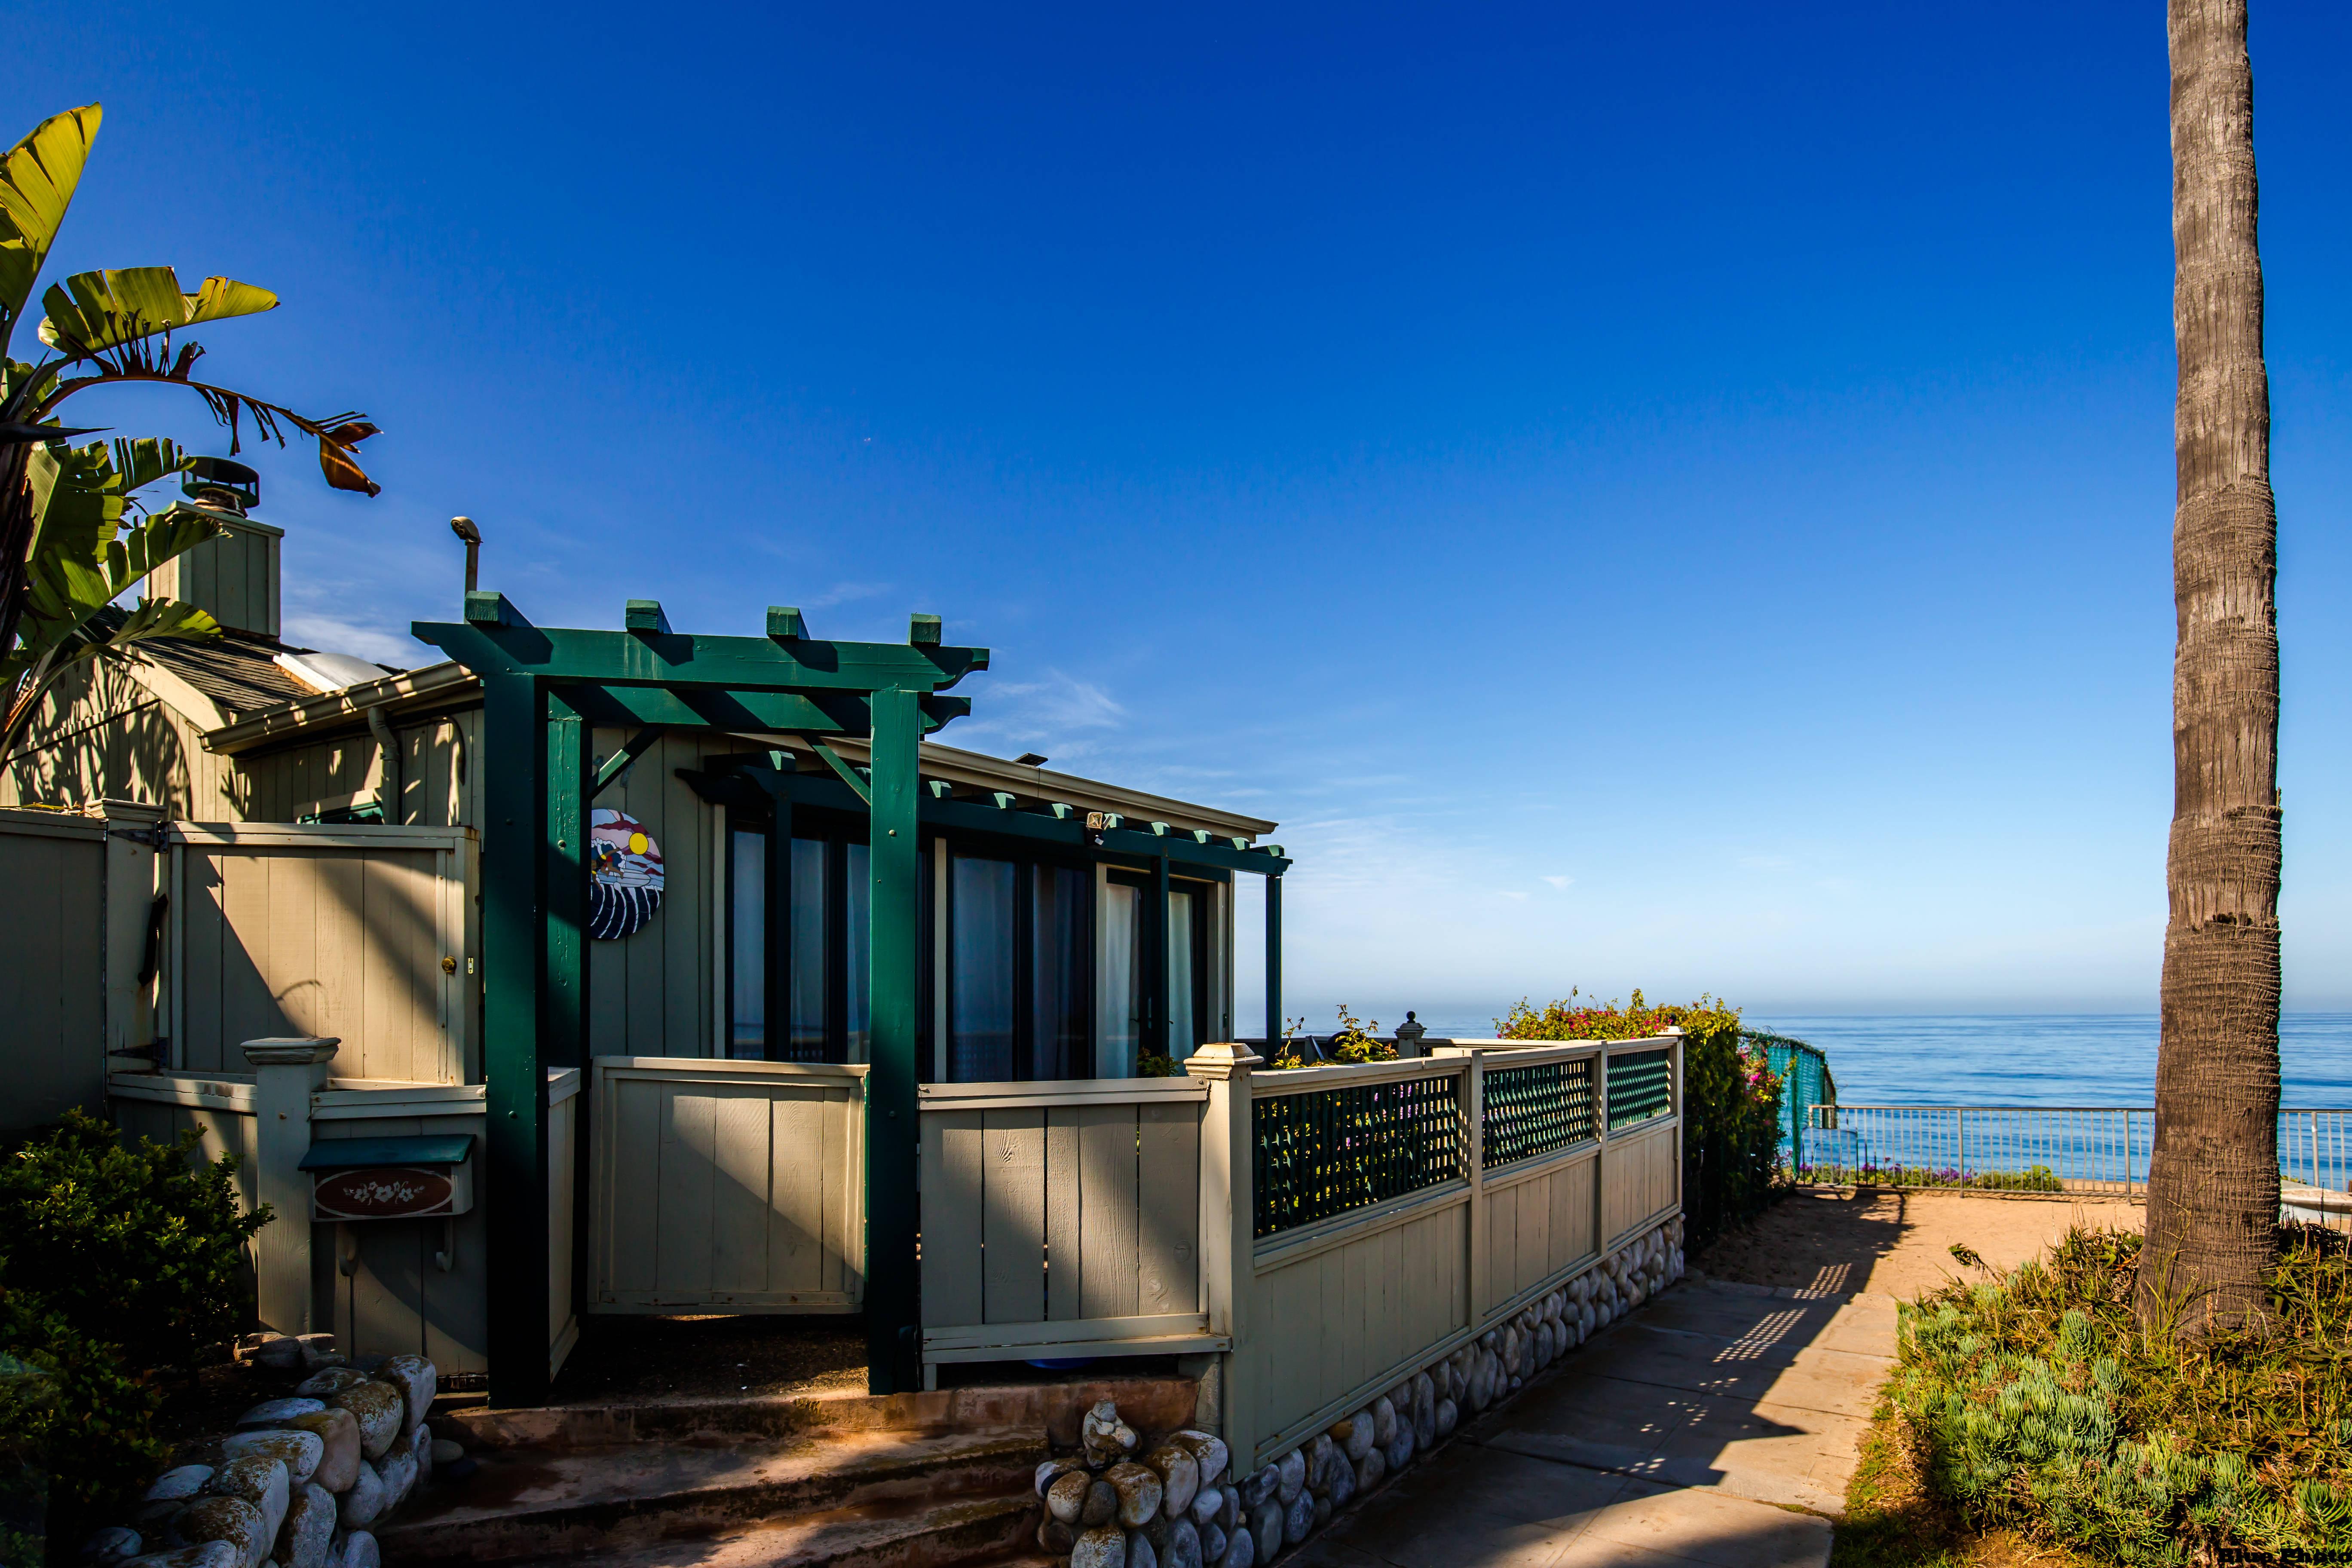 Tremendous Encinitas Ca West Of Interstate 5 Homes For Sale Download Free Architecture Designs Embacsunscenecom